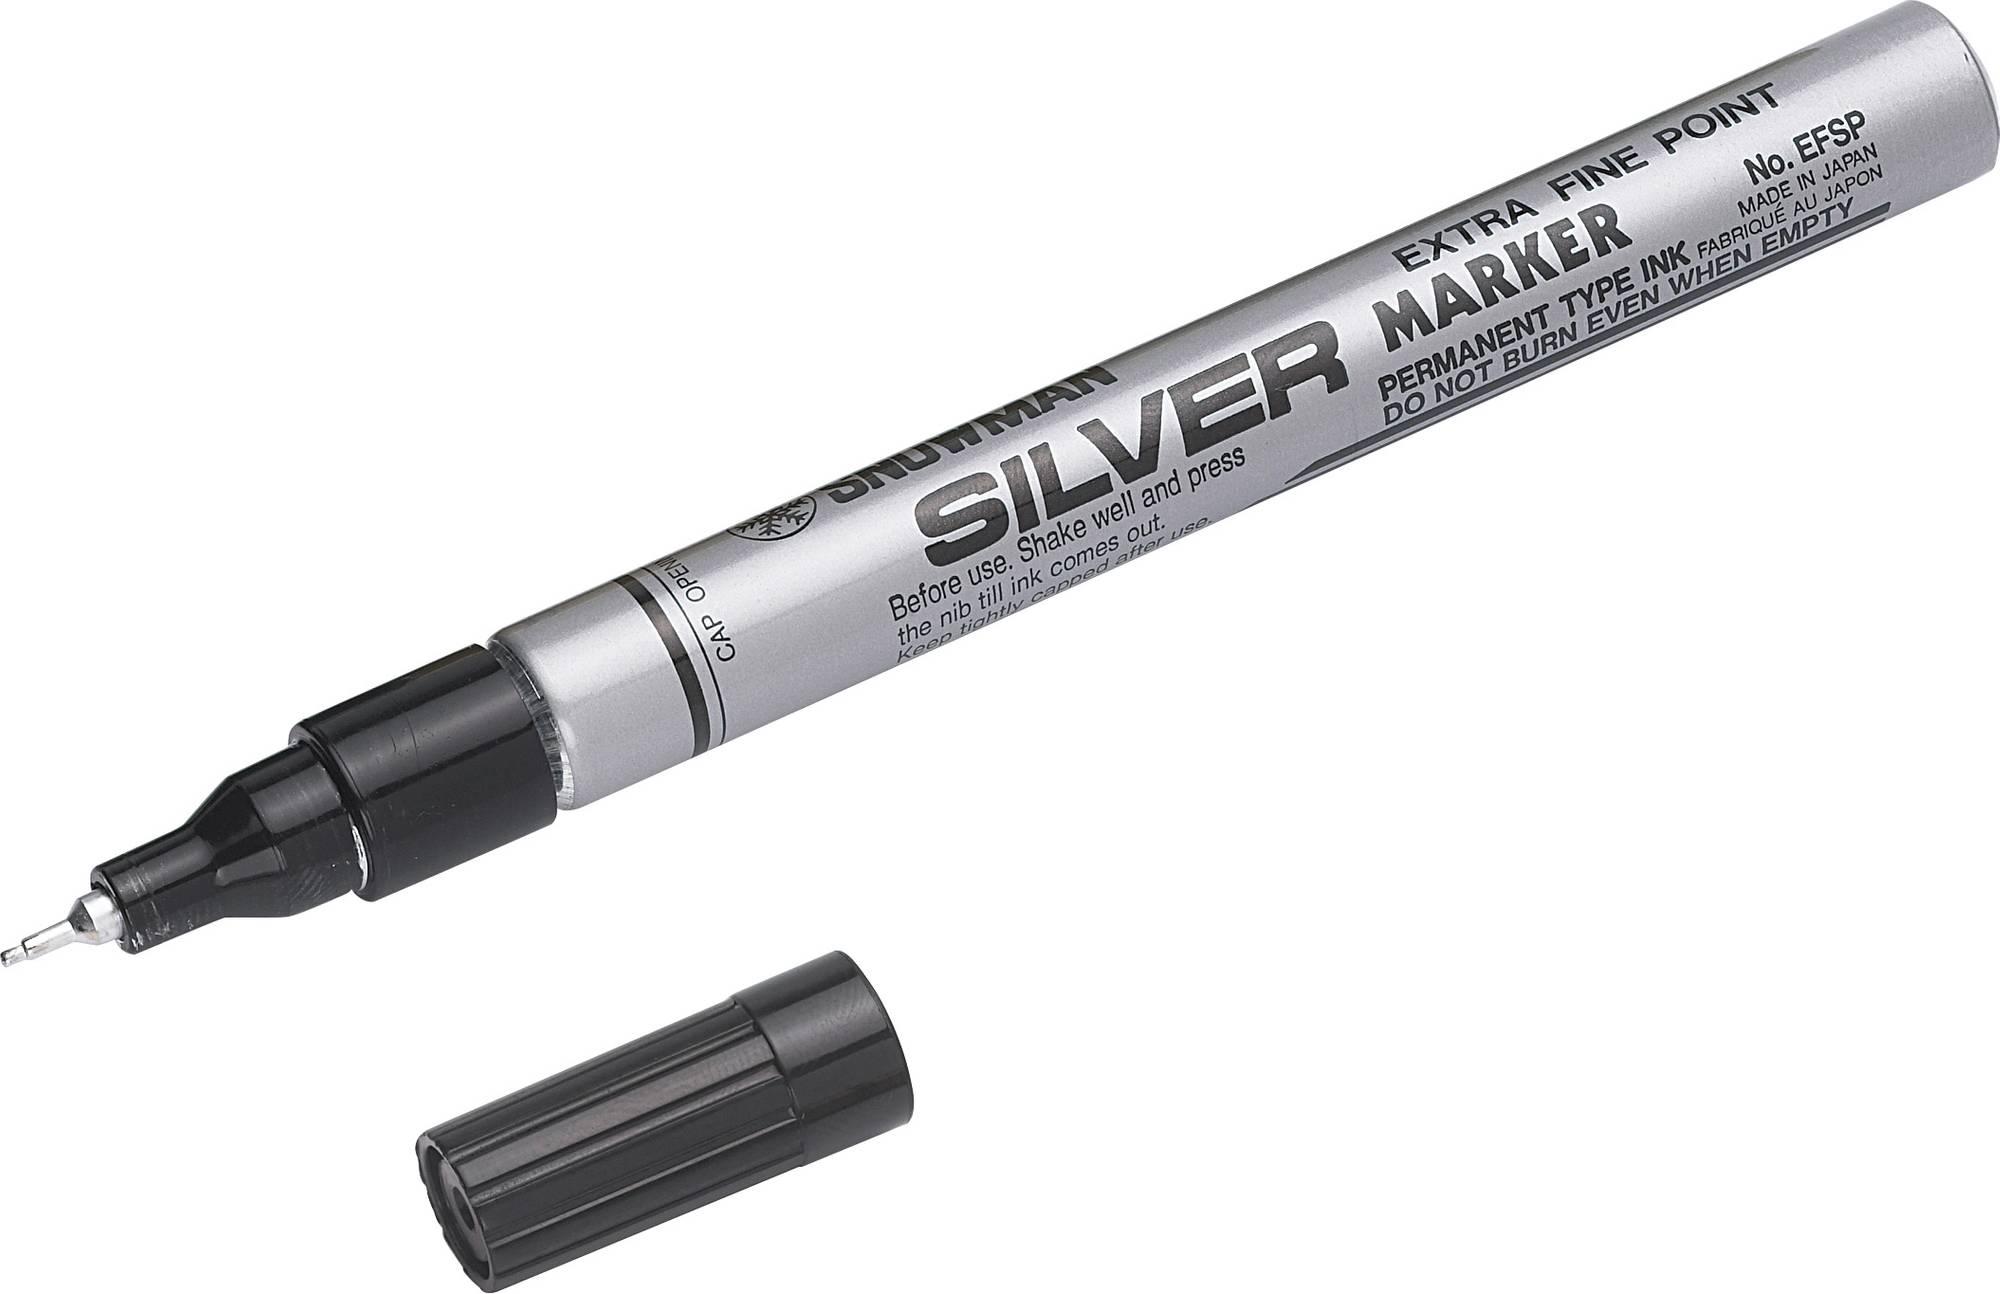 Tintenschreiber in silber